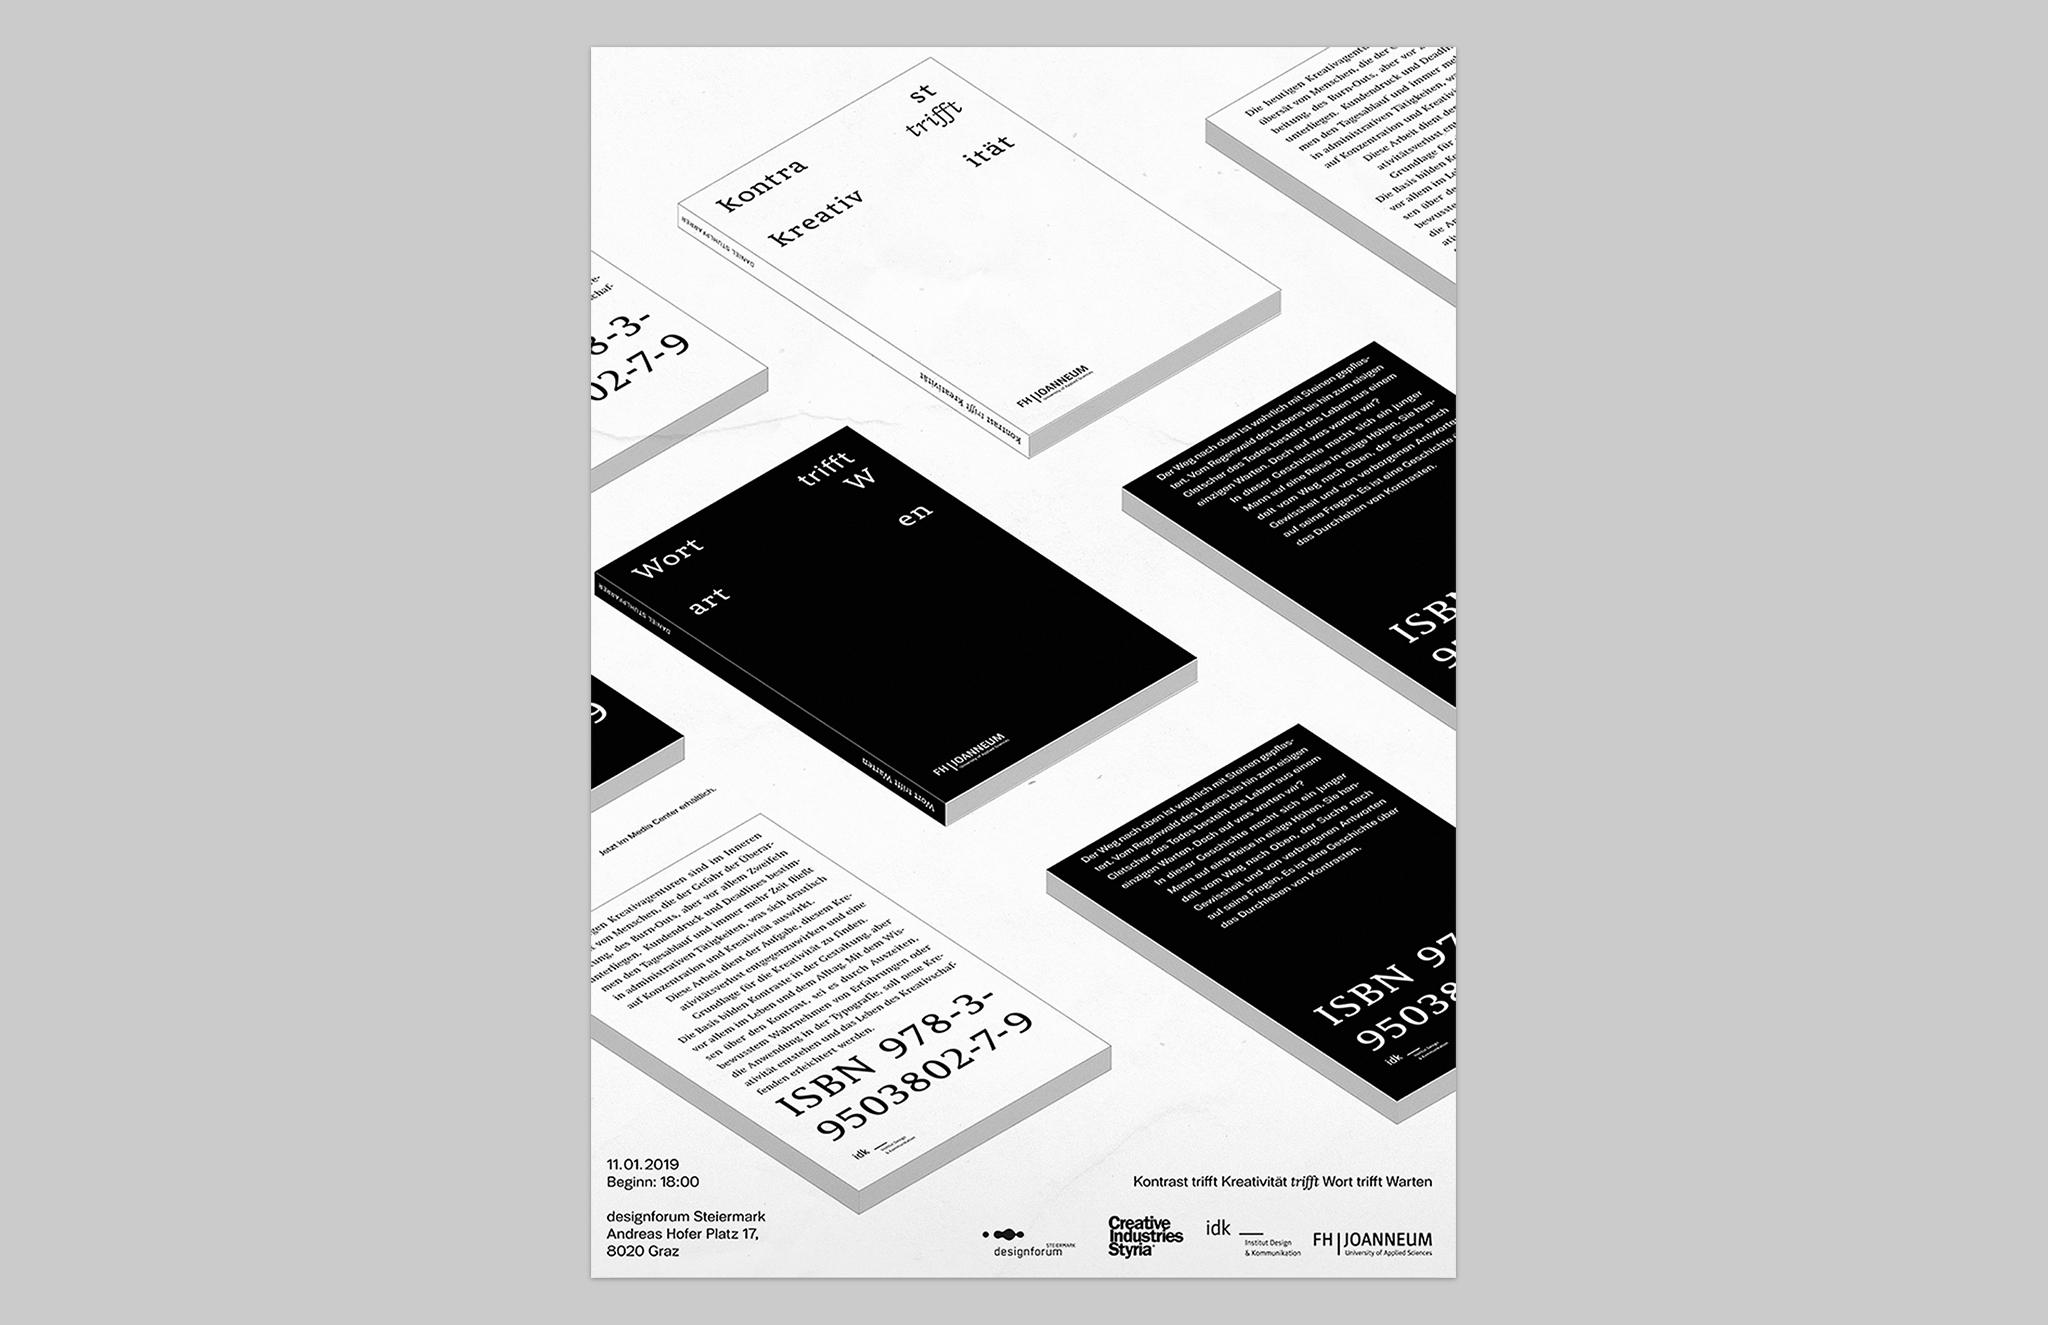 Daniel-Stuhlpfarrer_Visual-Communication_Graphic-Design_Poster_Kontrast-trifft-Kreativitaet-Wort-trifft-Warten-Bookpresentation_Overview-1